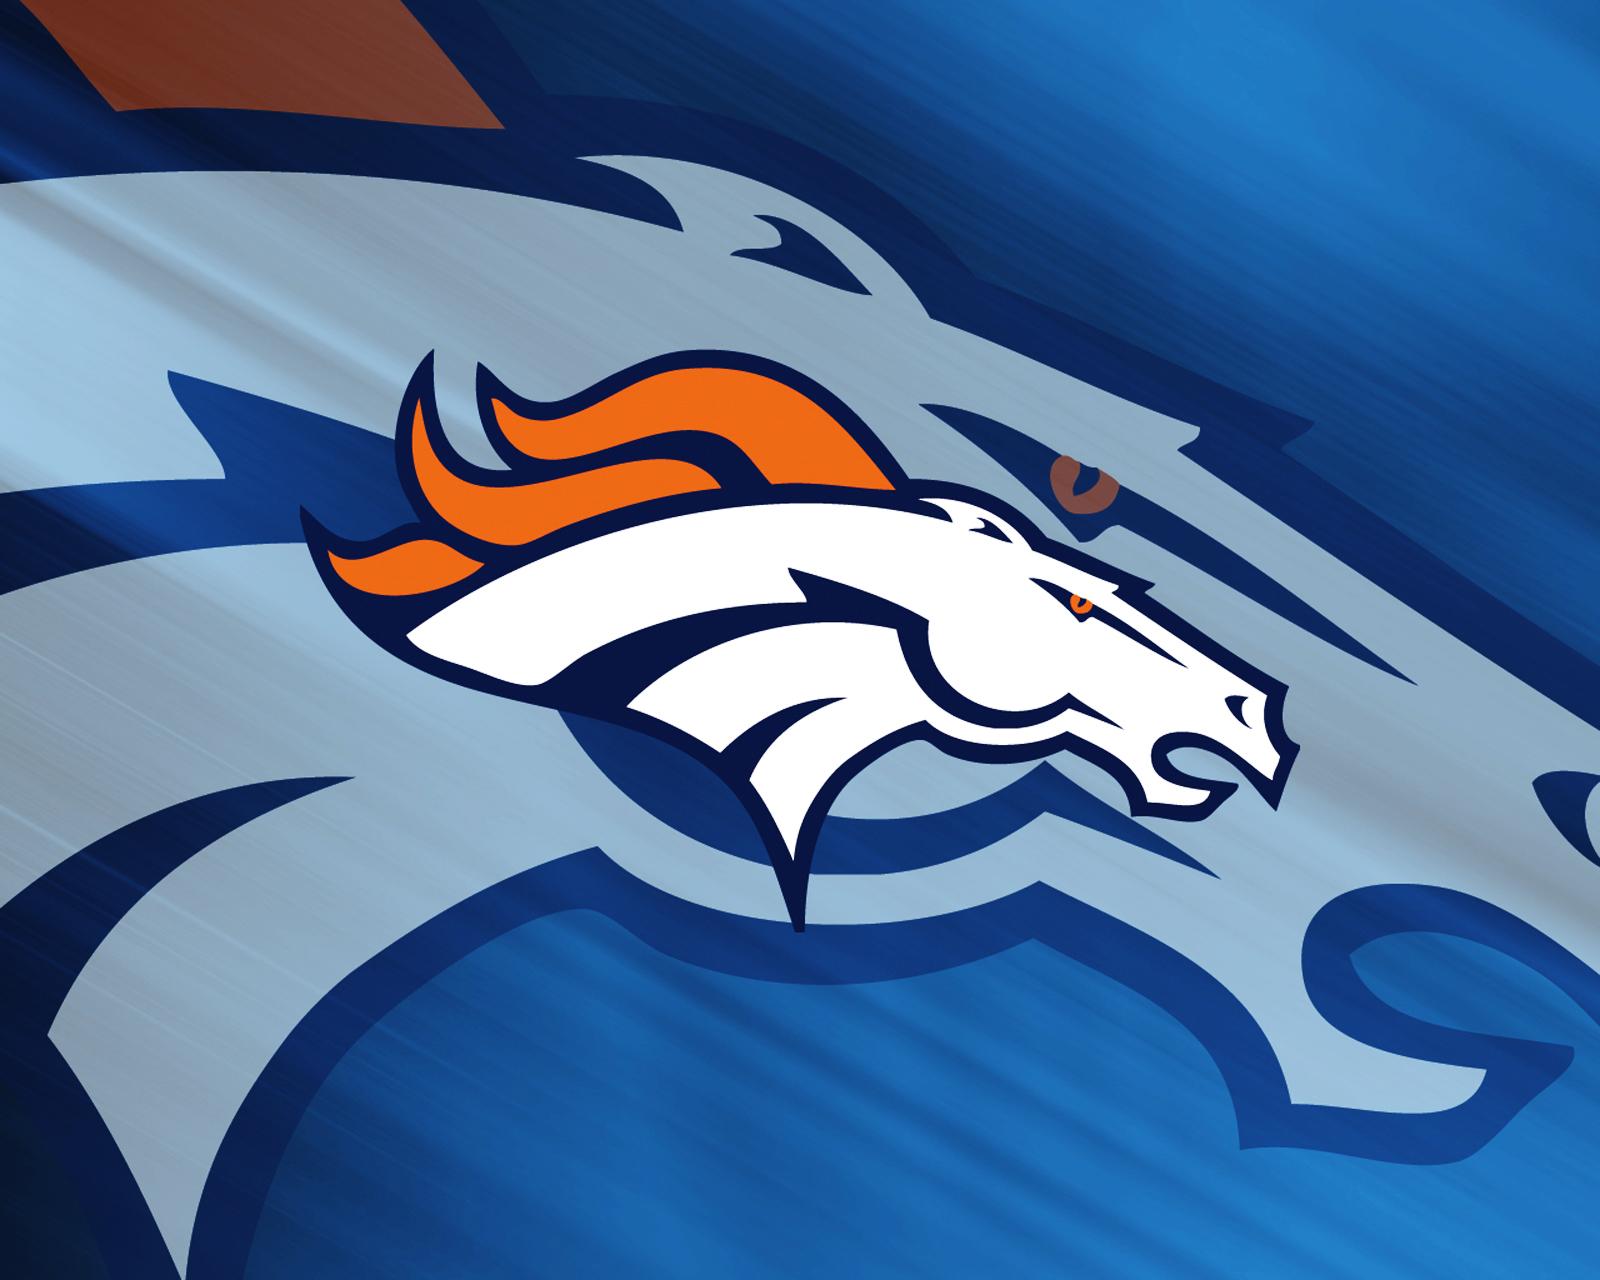 Denver Broncos Logo HD Wallpapers 1600x1280